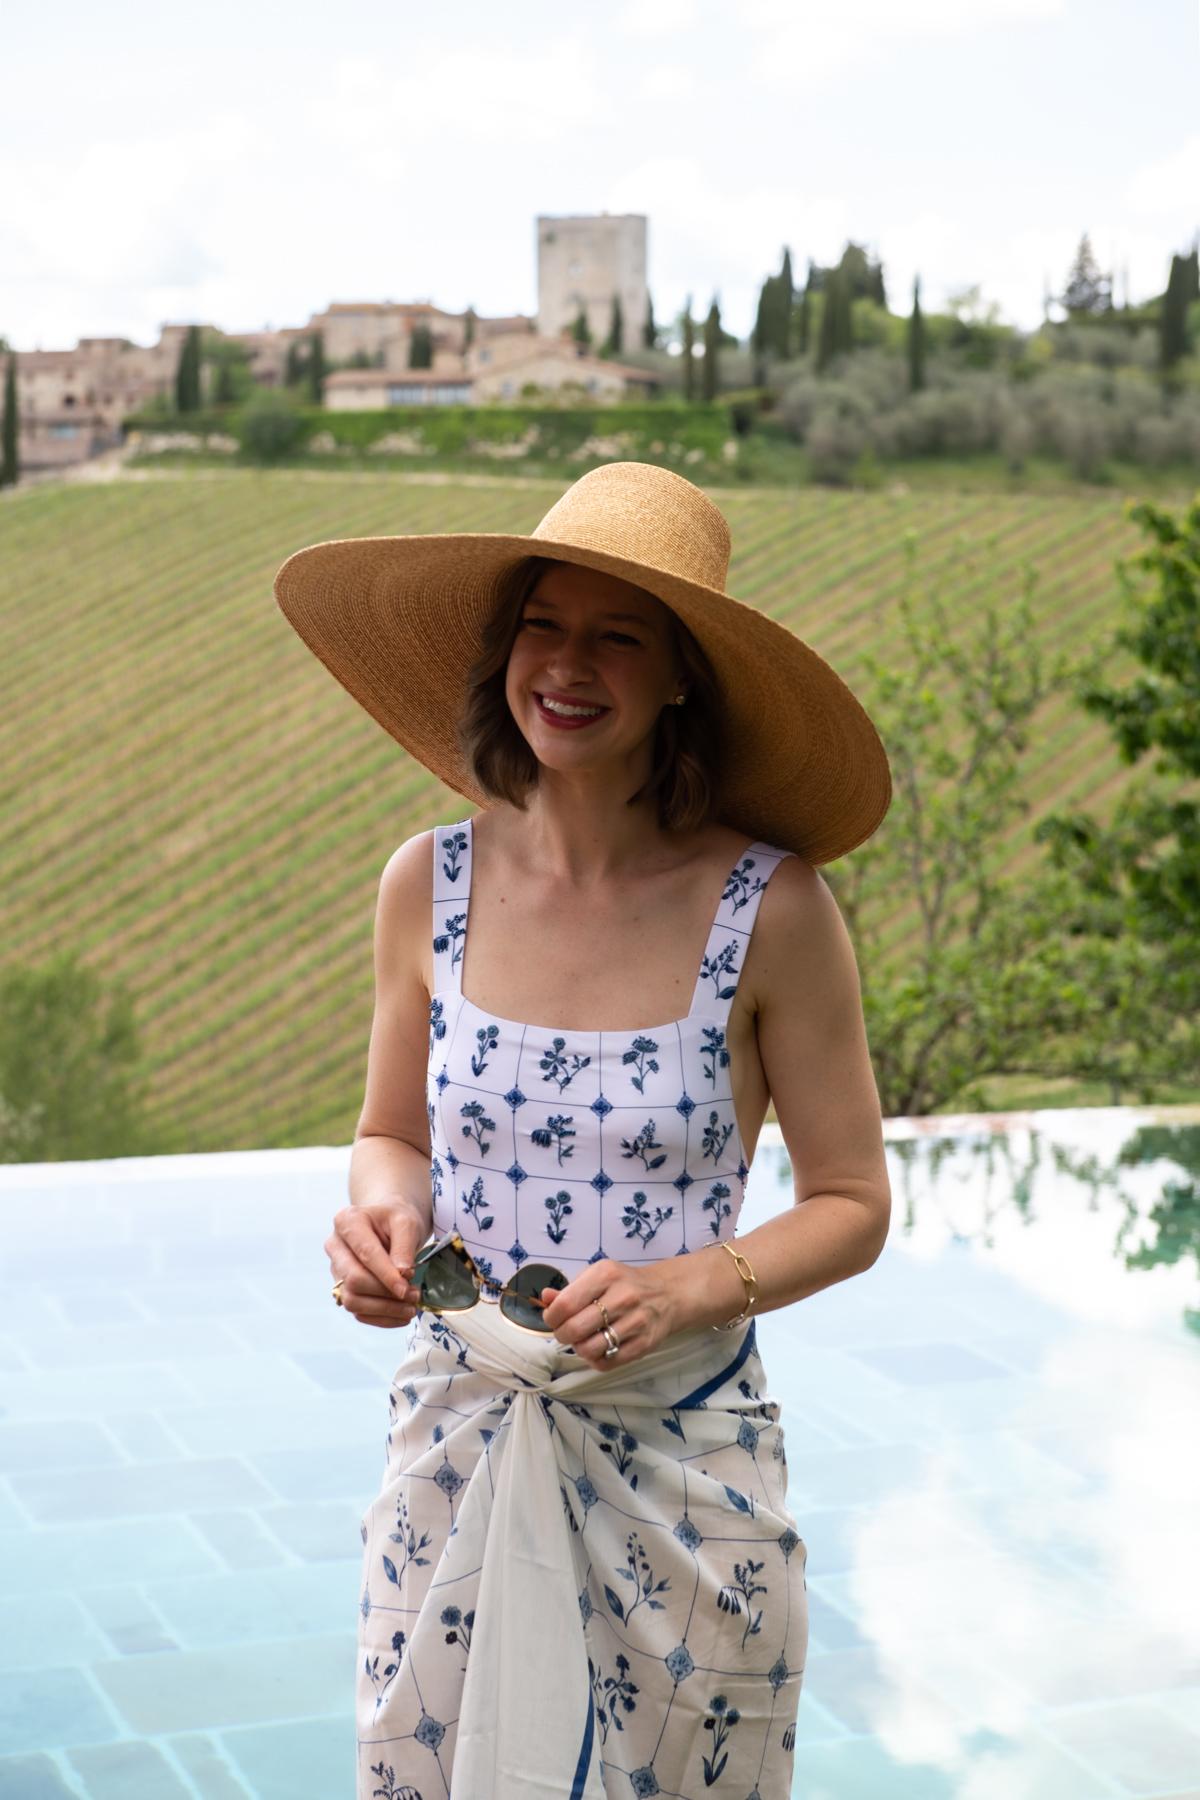 Stacie Flinner x Cuvee Tuscan Farmhouse Tuscany Italy Guide-58.jpg